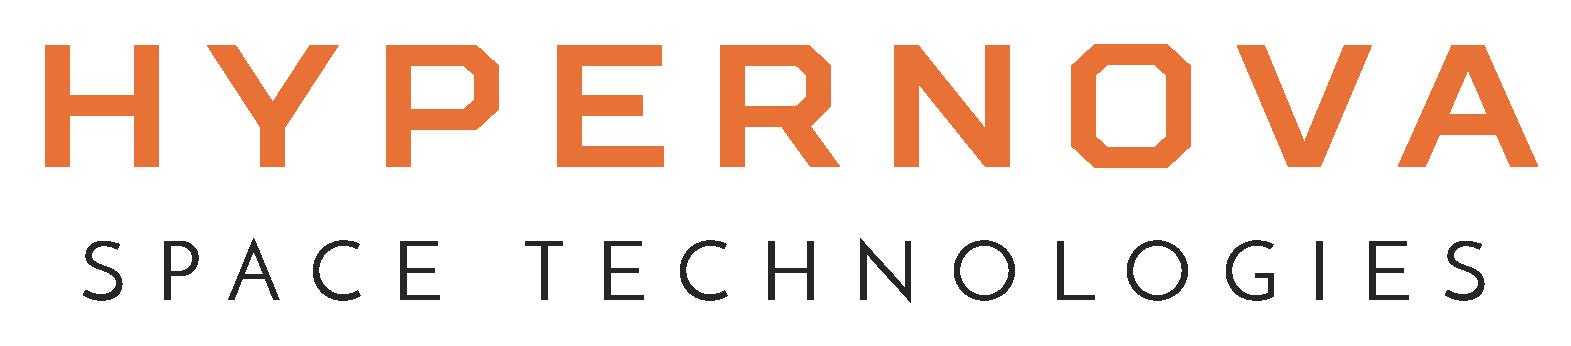 Hypernova Space Technologies